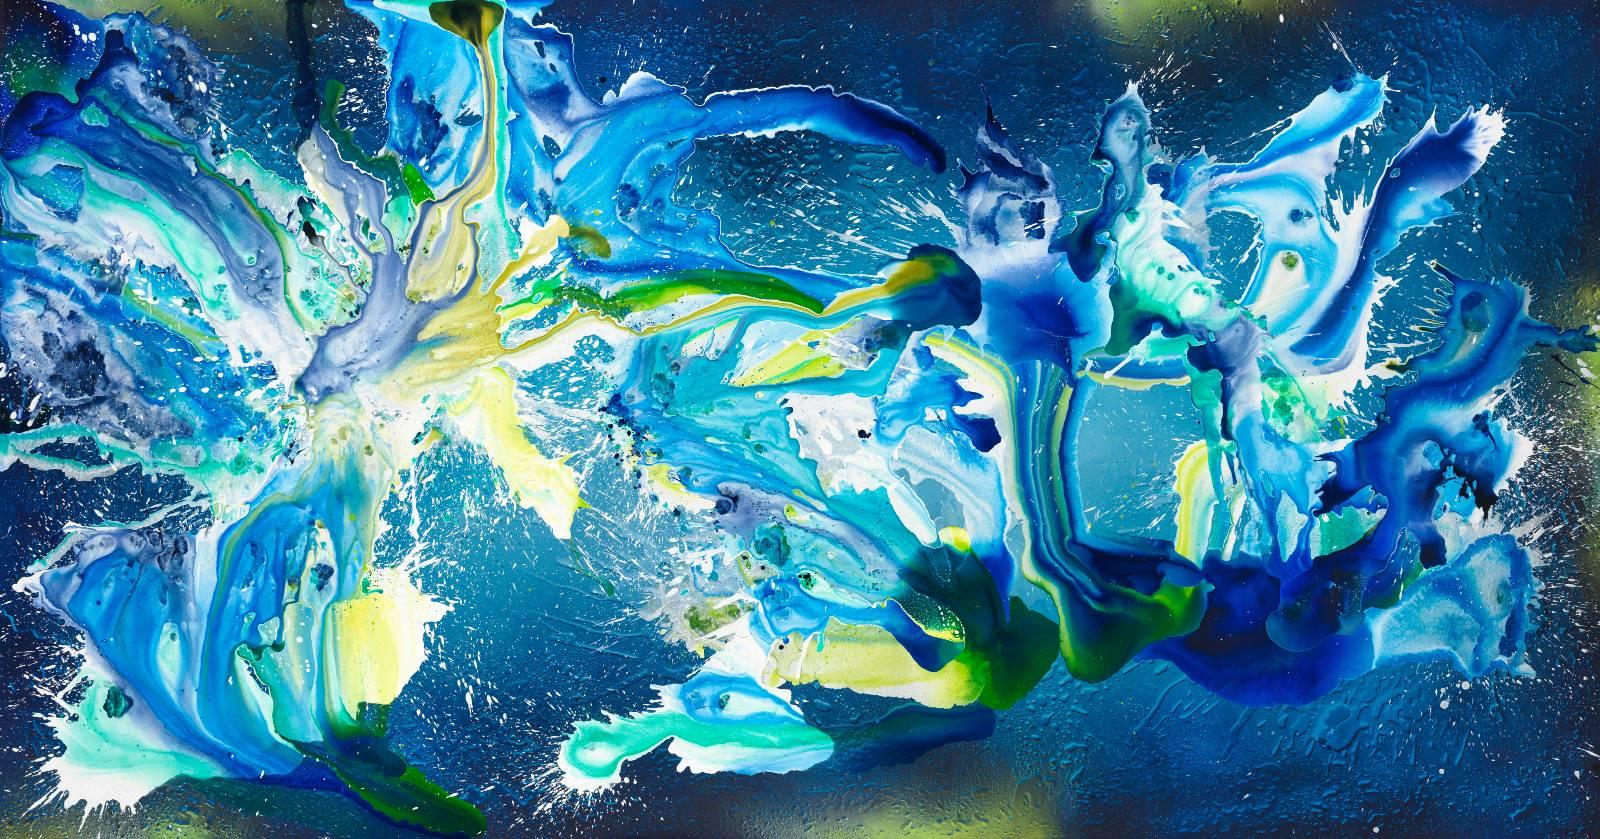 Christian Awe | Wasserspiele.